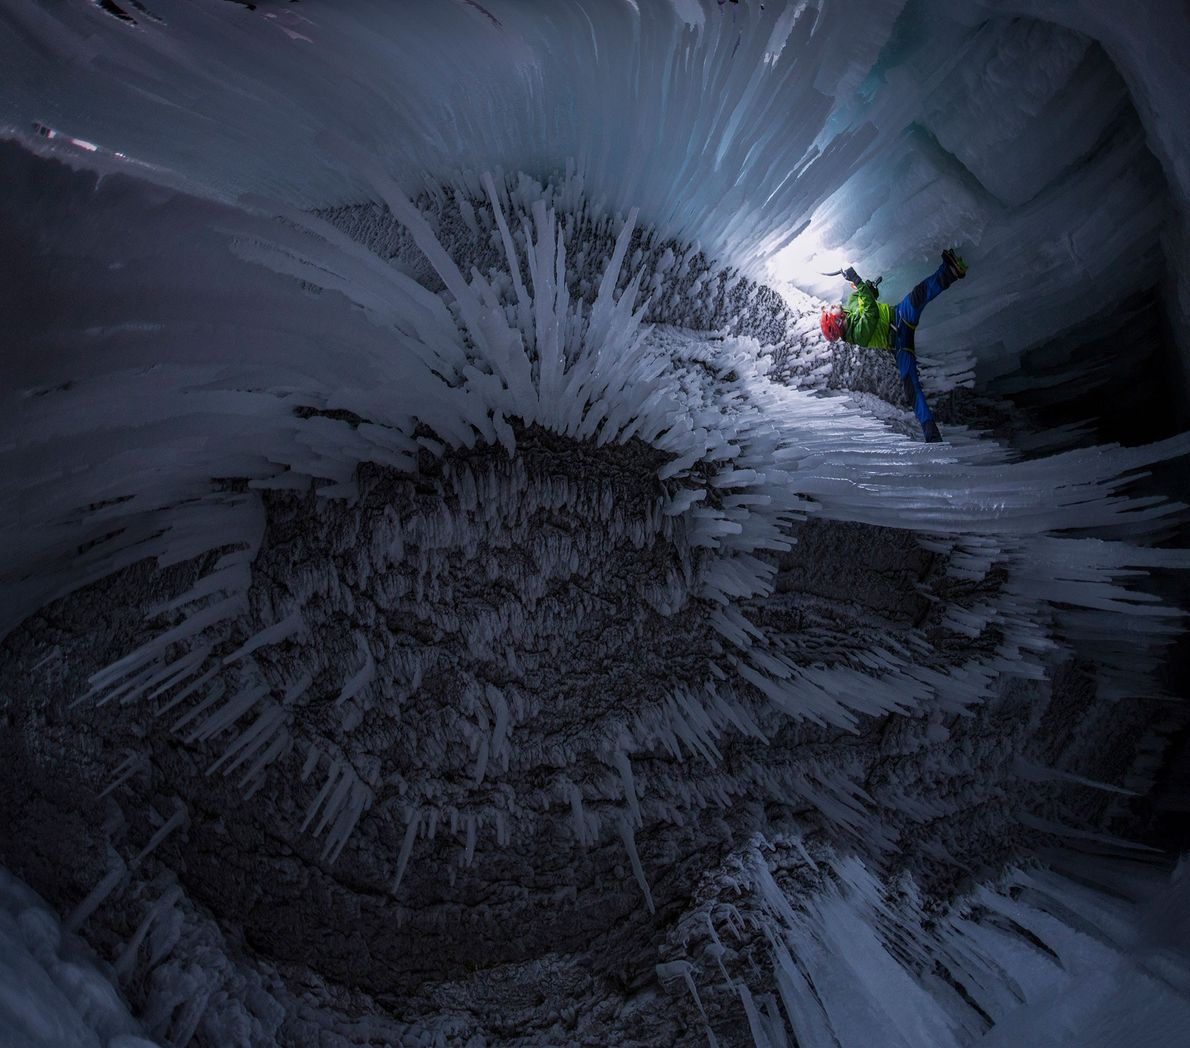 21 Aventuras Únicas no Gelo: Parque Nacional de Banff, Canadá